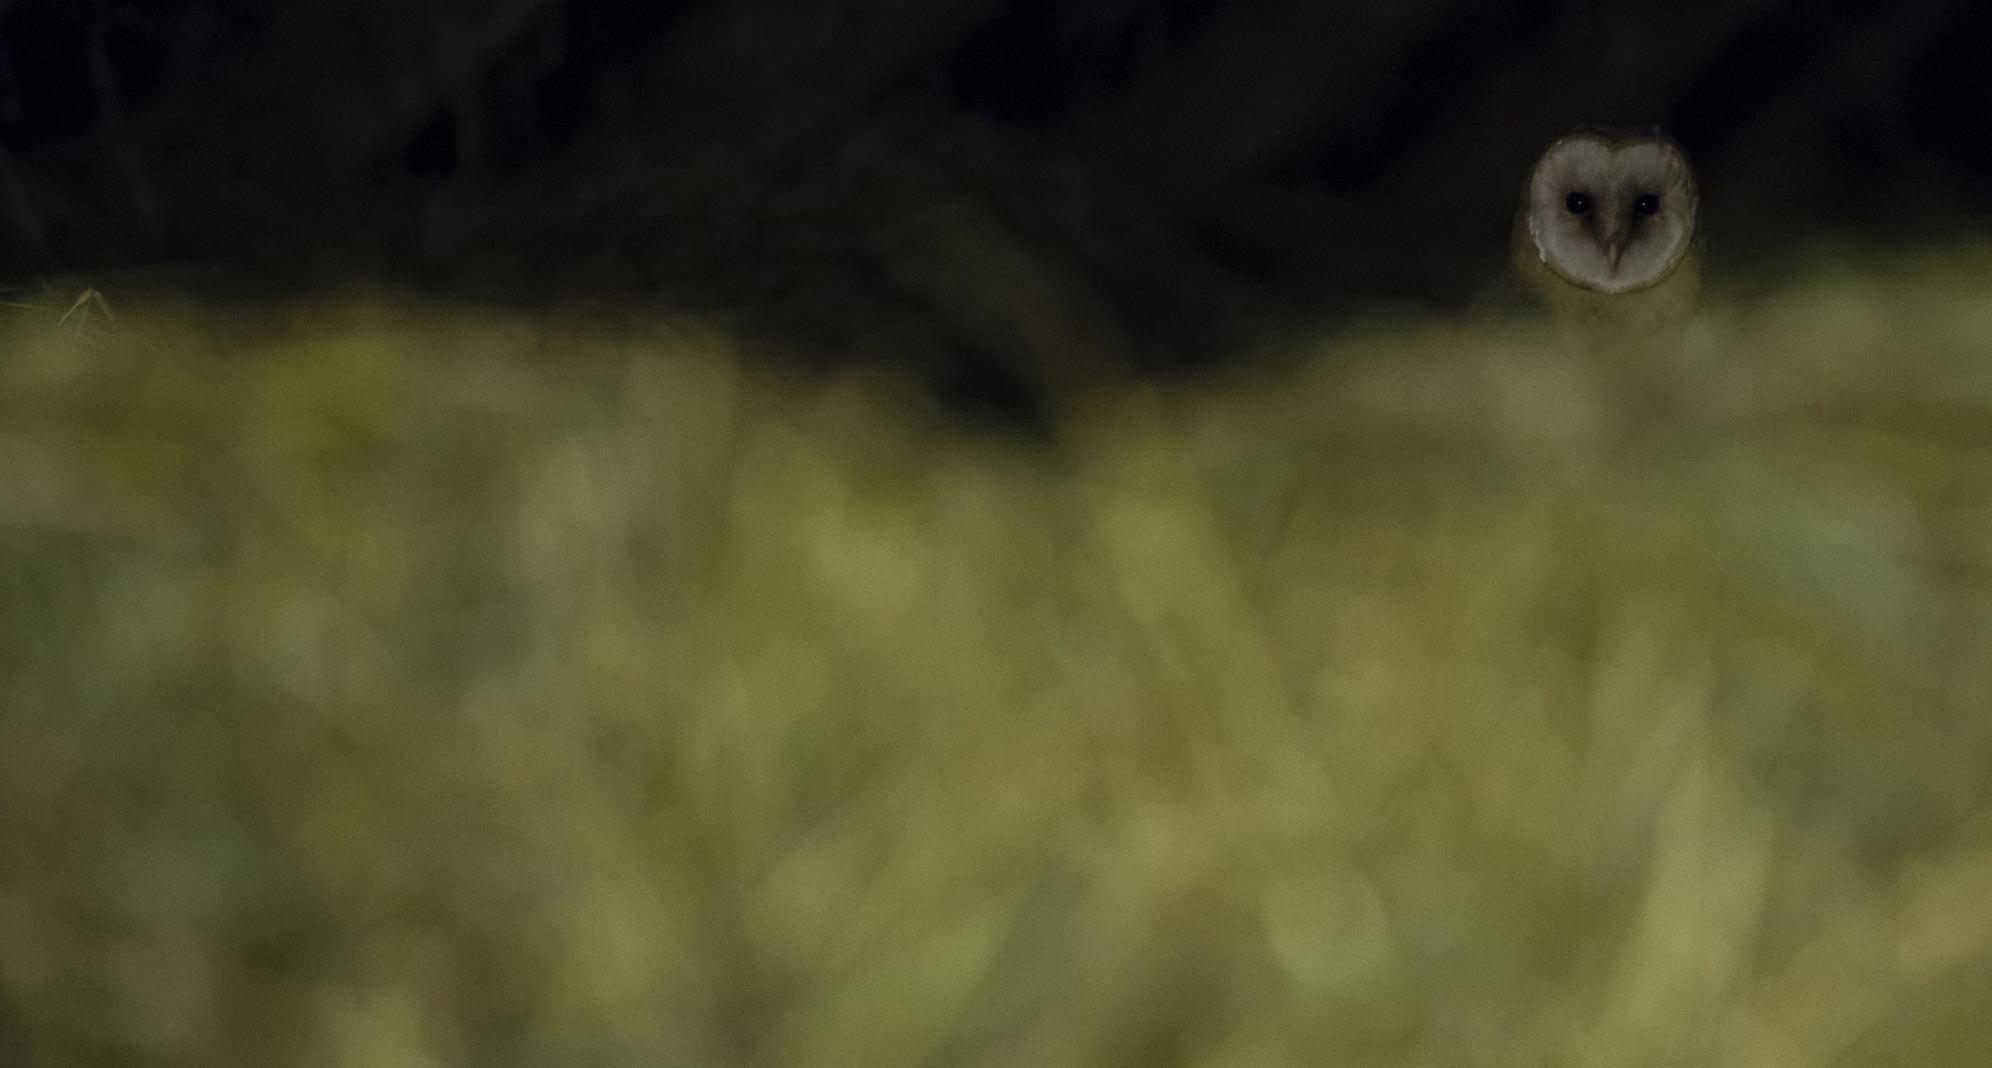 k-schleiereule-foto-8-karsten-mosebach